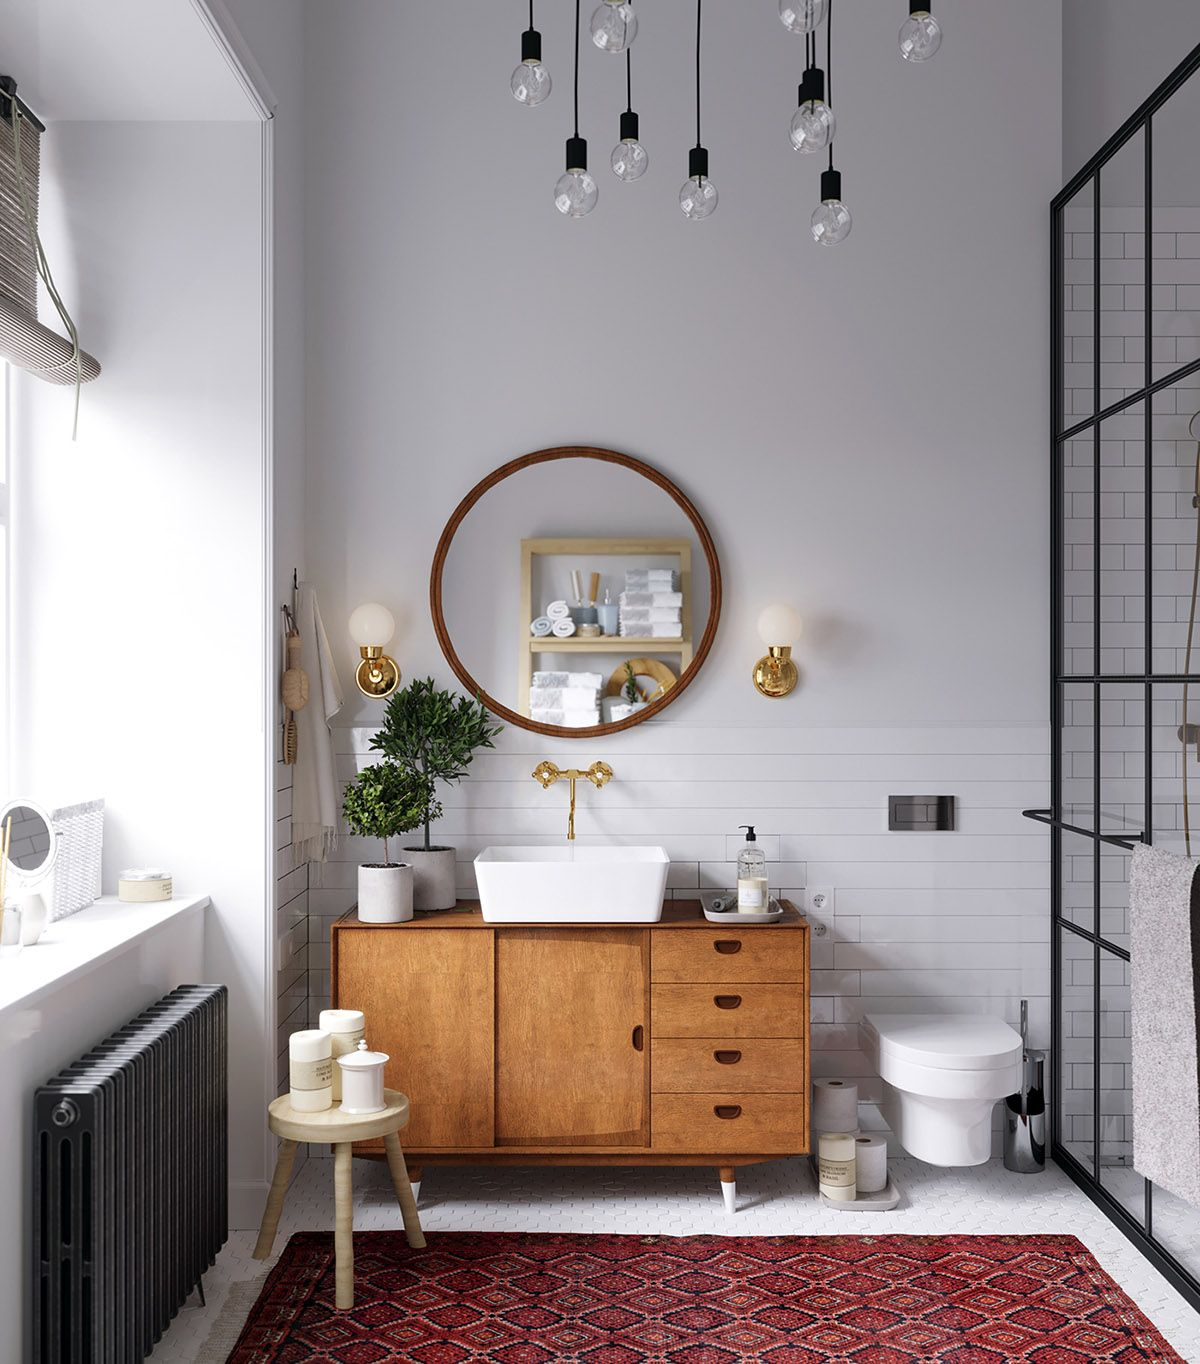 5 Gorgeous Scandinavian Bathroom Ideas: Earthy Eclectic Scandinavian Style Interior